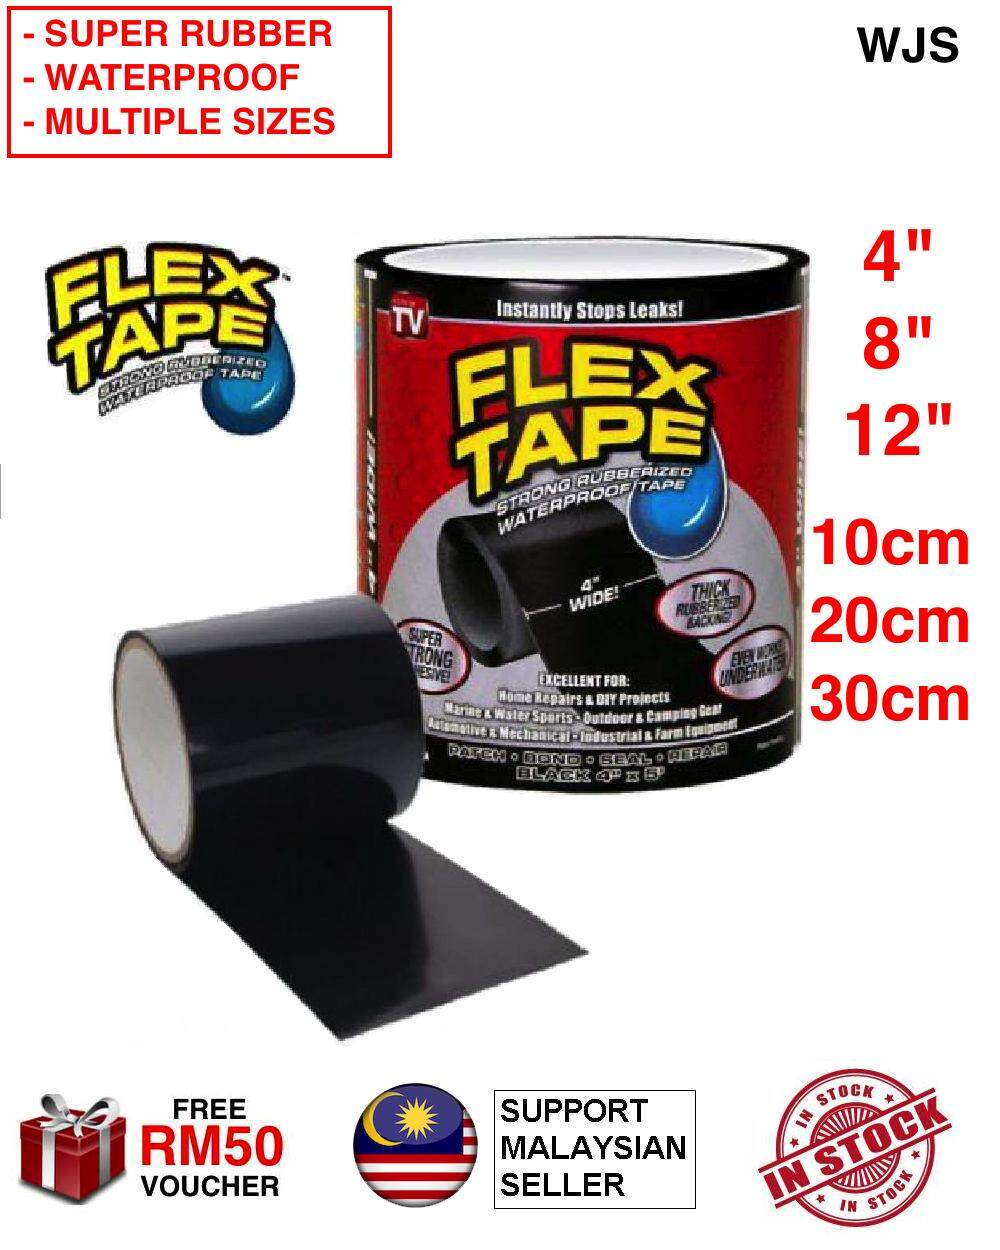 (SUPER STRONG WATERPROOF RUBBER) WJS 2 pc 2 pcs Jumbo Waterproof Sealing Flex Tape Patch Bond Super Strong Rubberized Rubberised Waterproof Seal Repair Cell Tape OPP Tape Rubber Tape PVC Tape Fix Hole Fix Leaking BLACK MULTIPLE SIZES [FREE RM 50 VOUCHER]